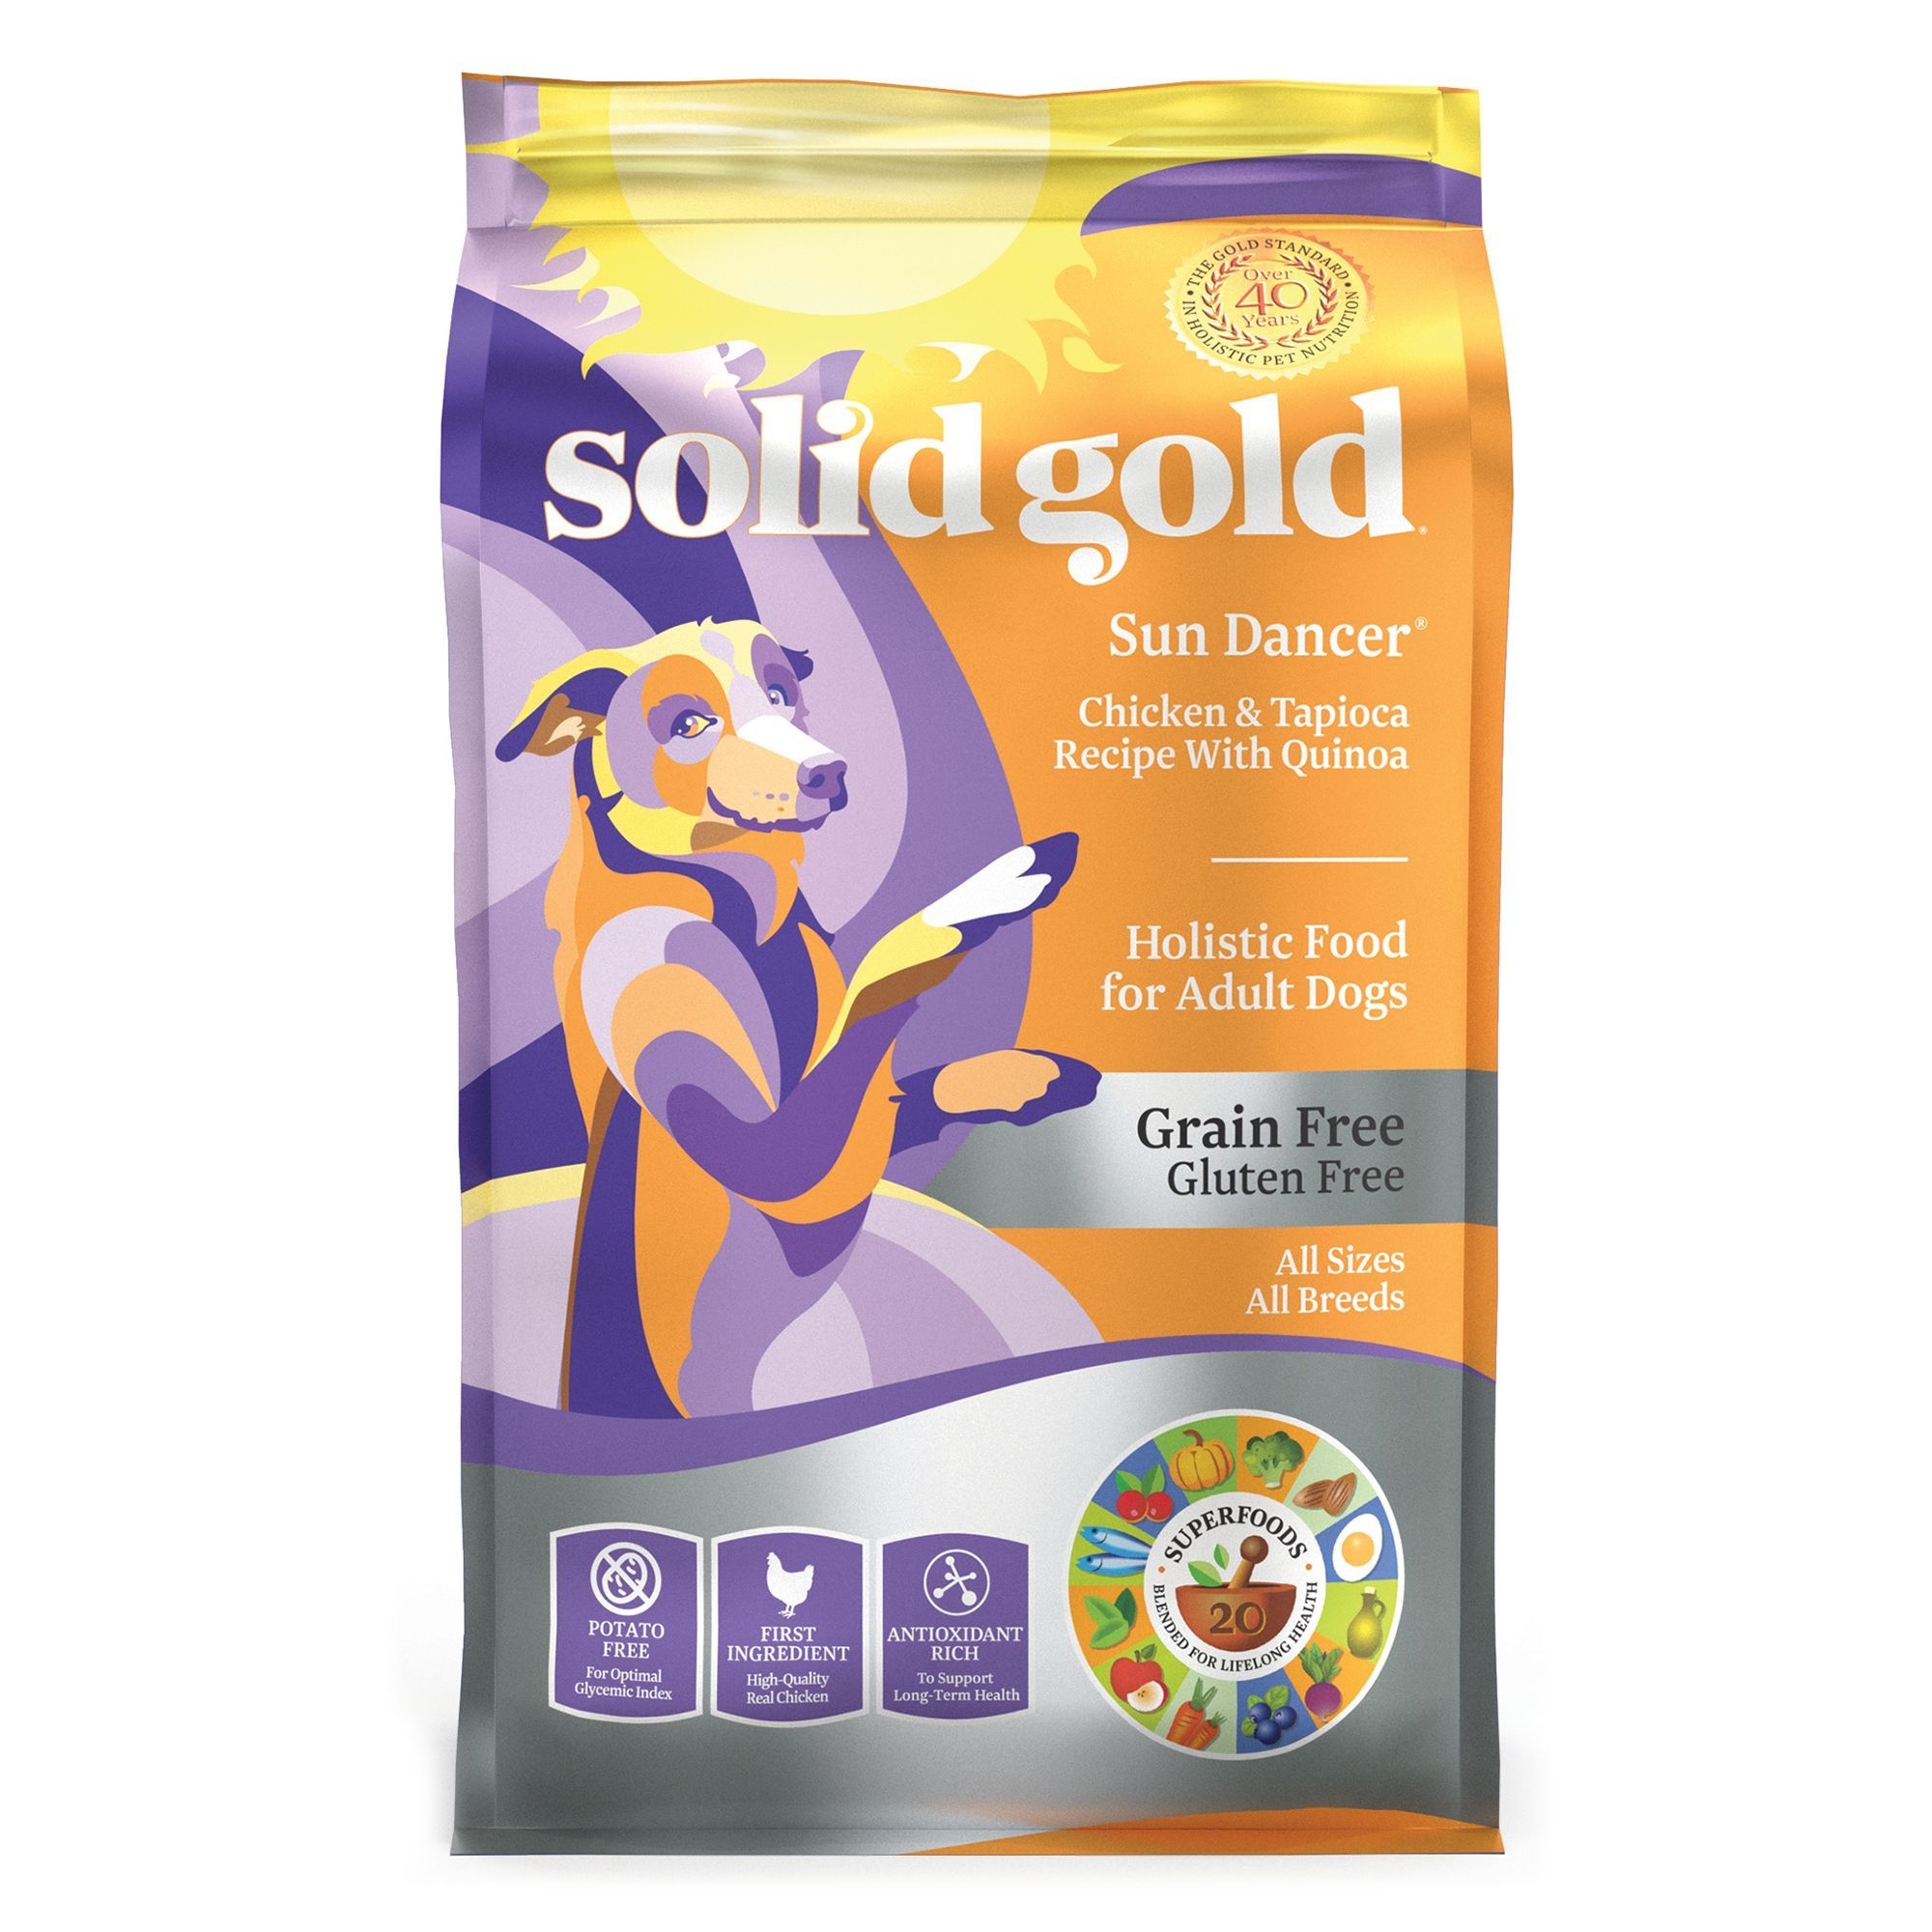 Solid Gold Sun Dancer Adult Dog Food Grain Free Gluten Free